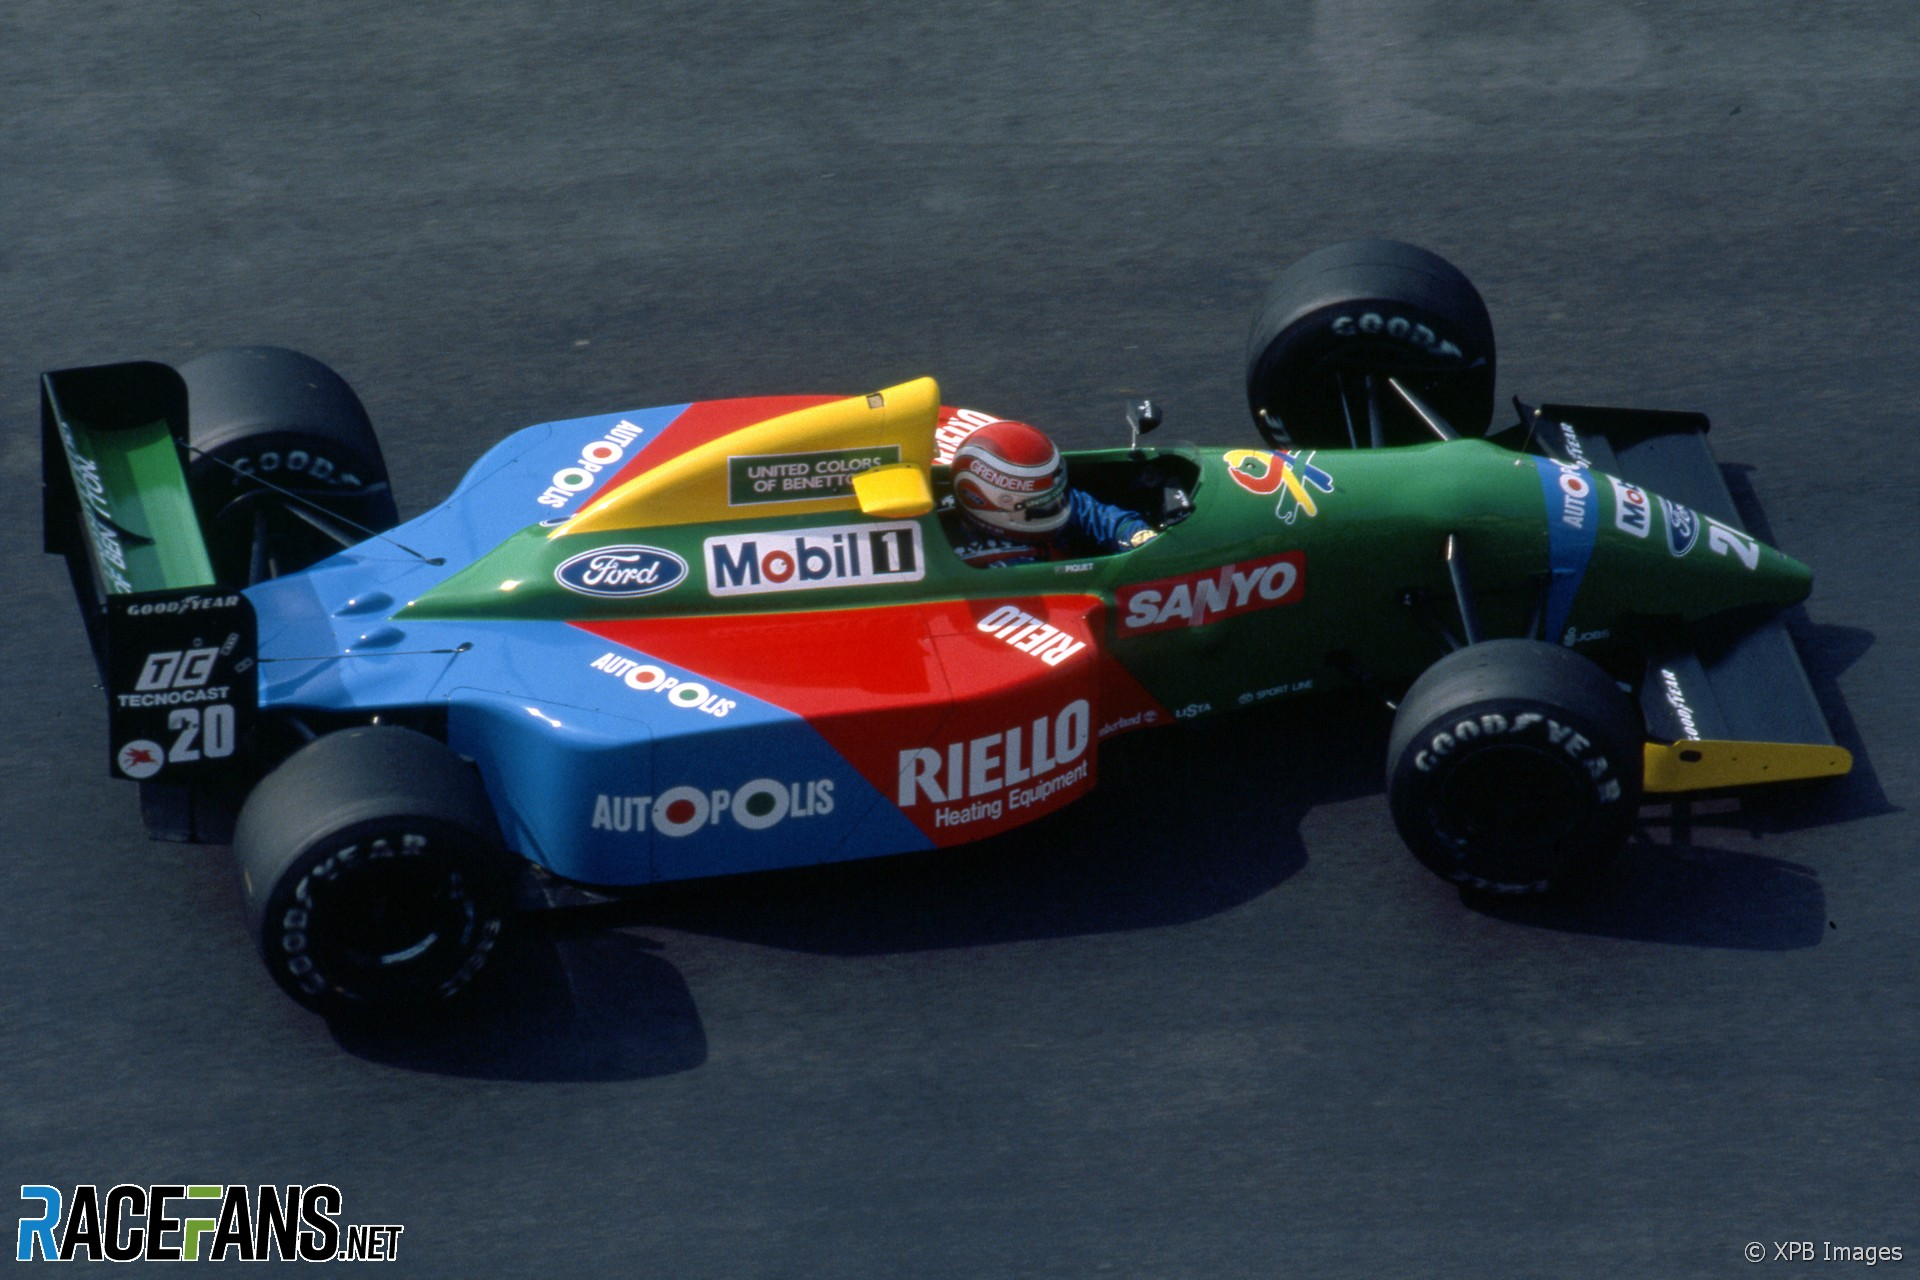 Nelson Piquet, Benetton, Monaco, 1990